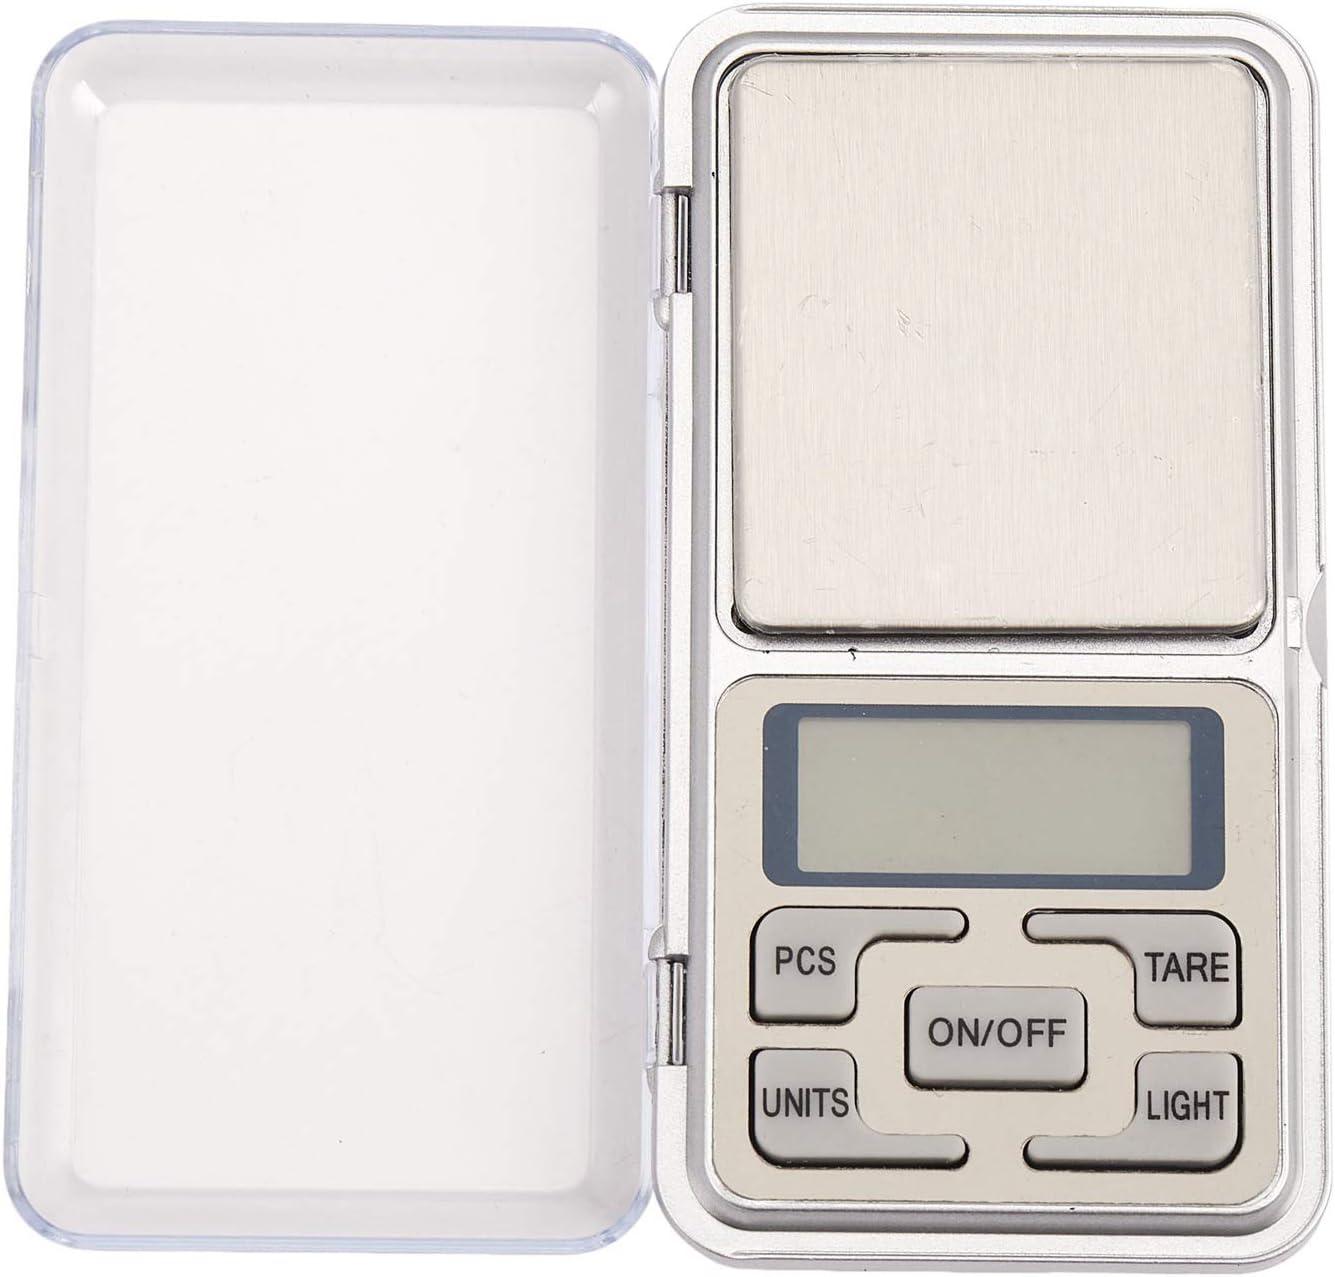 TOOGOO 500g x 0.01g bascula Digital Bascula de Joya Herramientas de Peso de Bolsillo de medicion de de Alta Precision Pantalla LCD